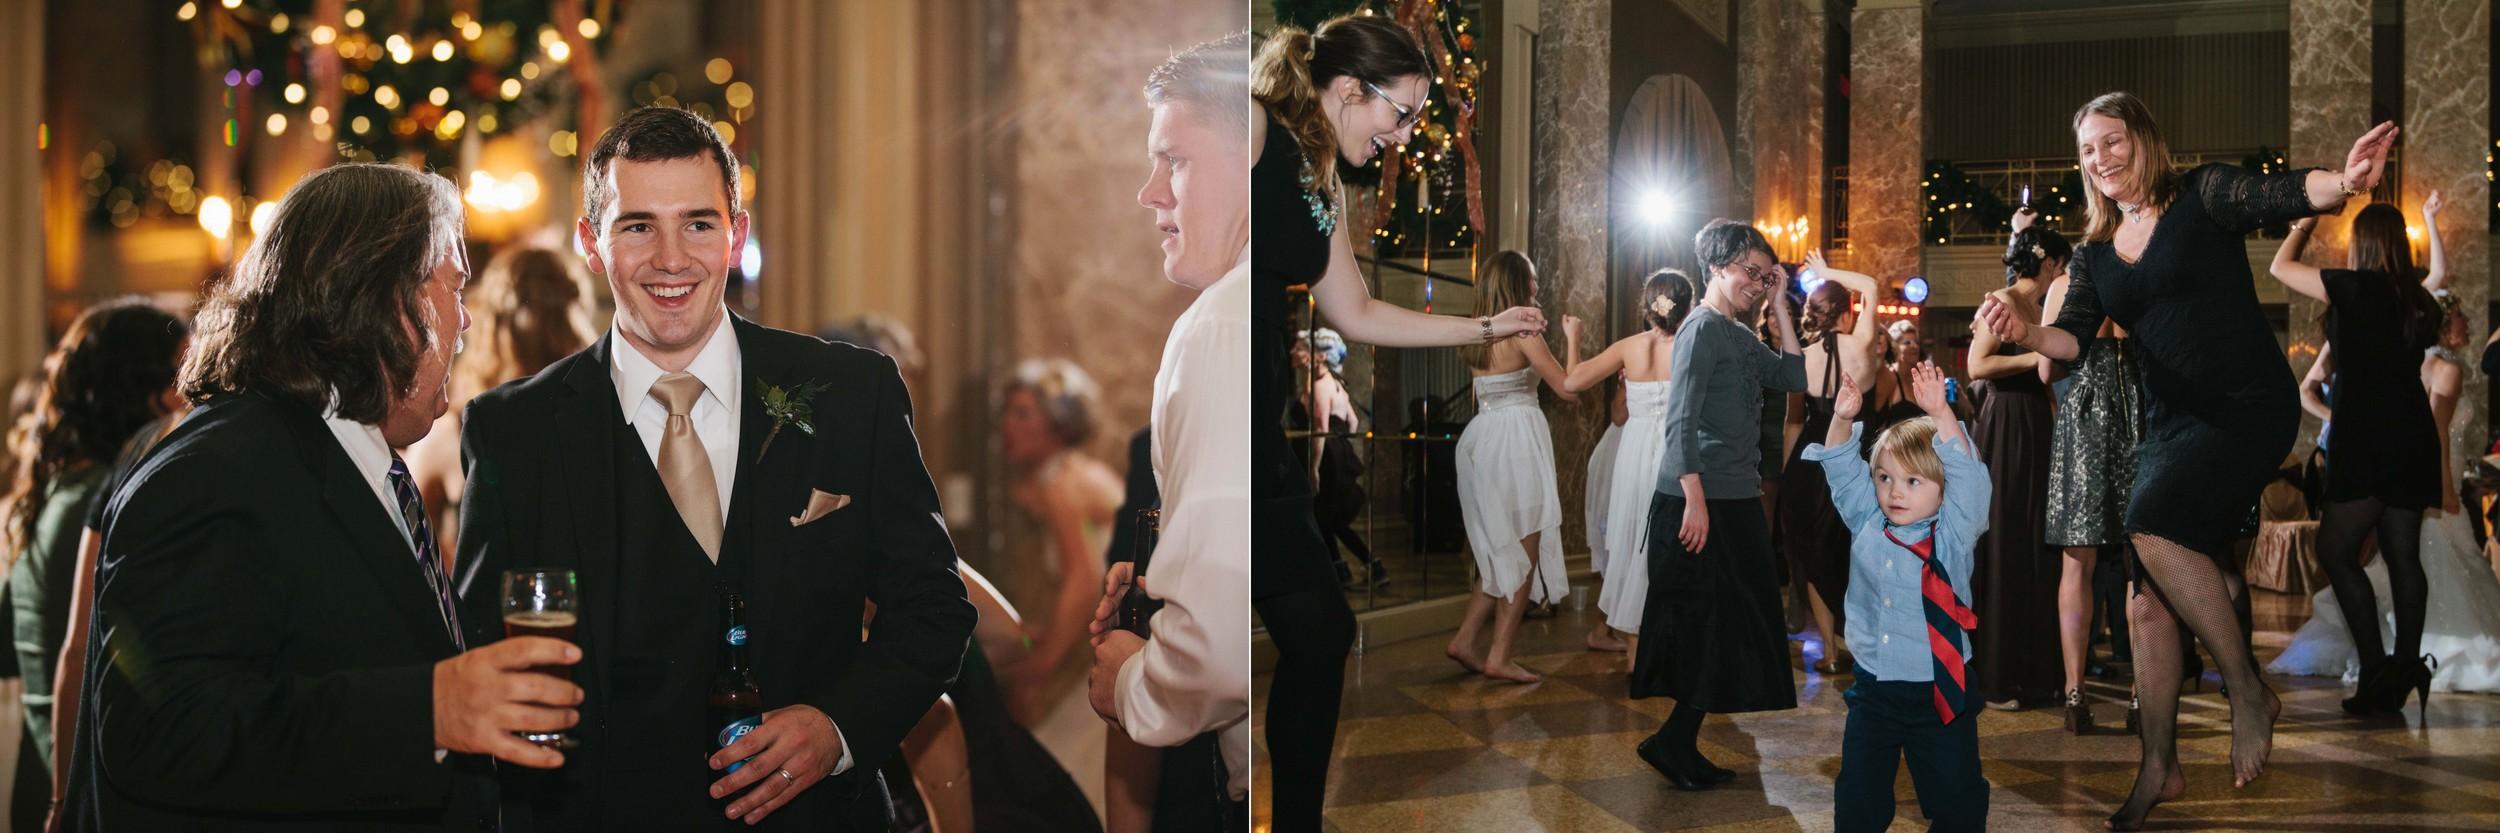 St Louis Wedding Photography-1099 copy.jpg